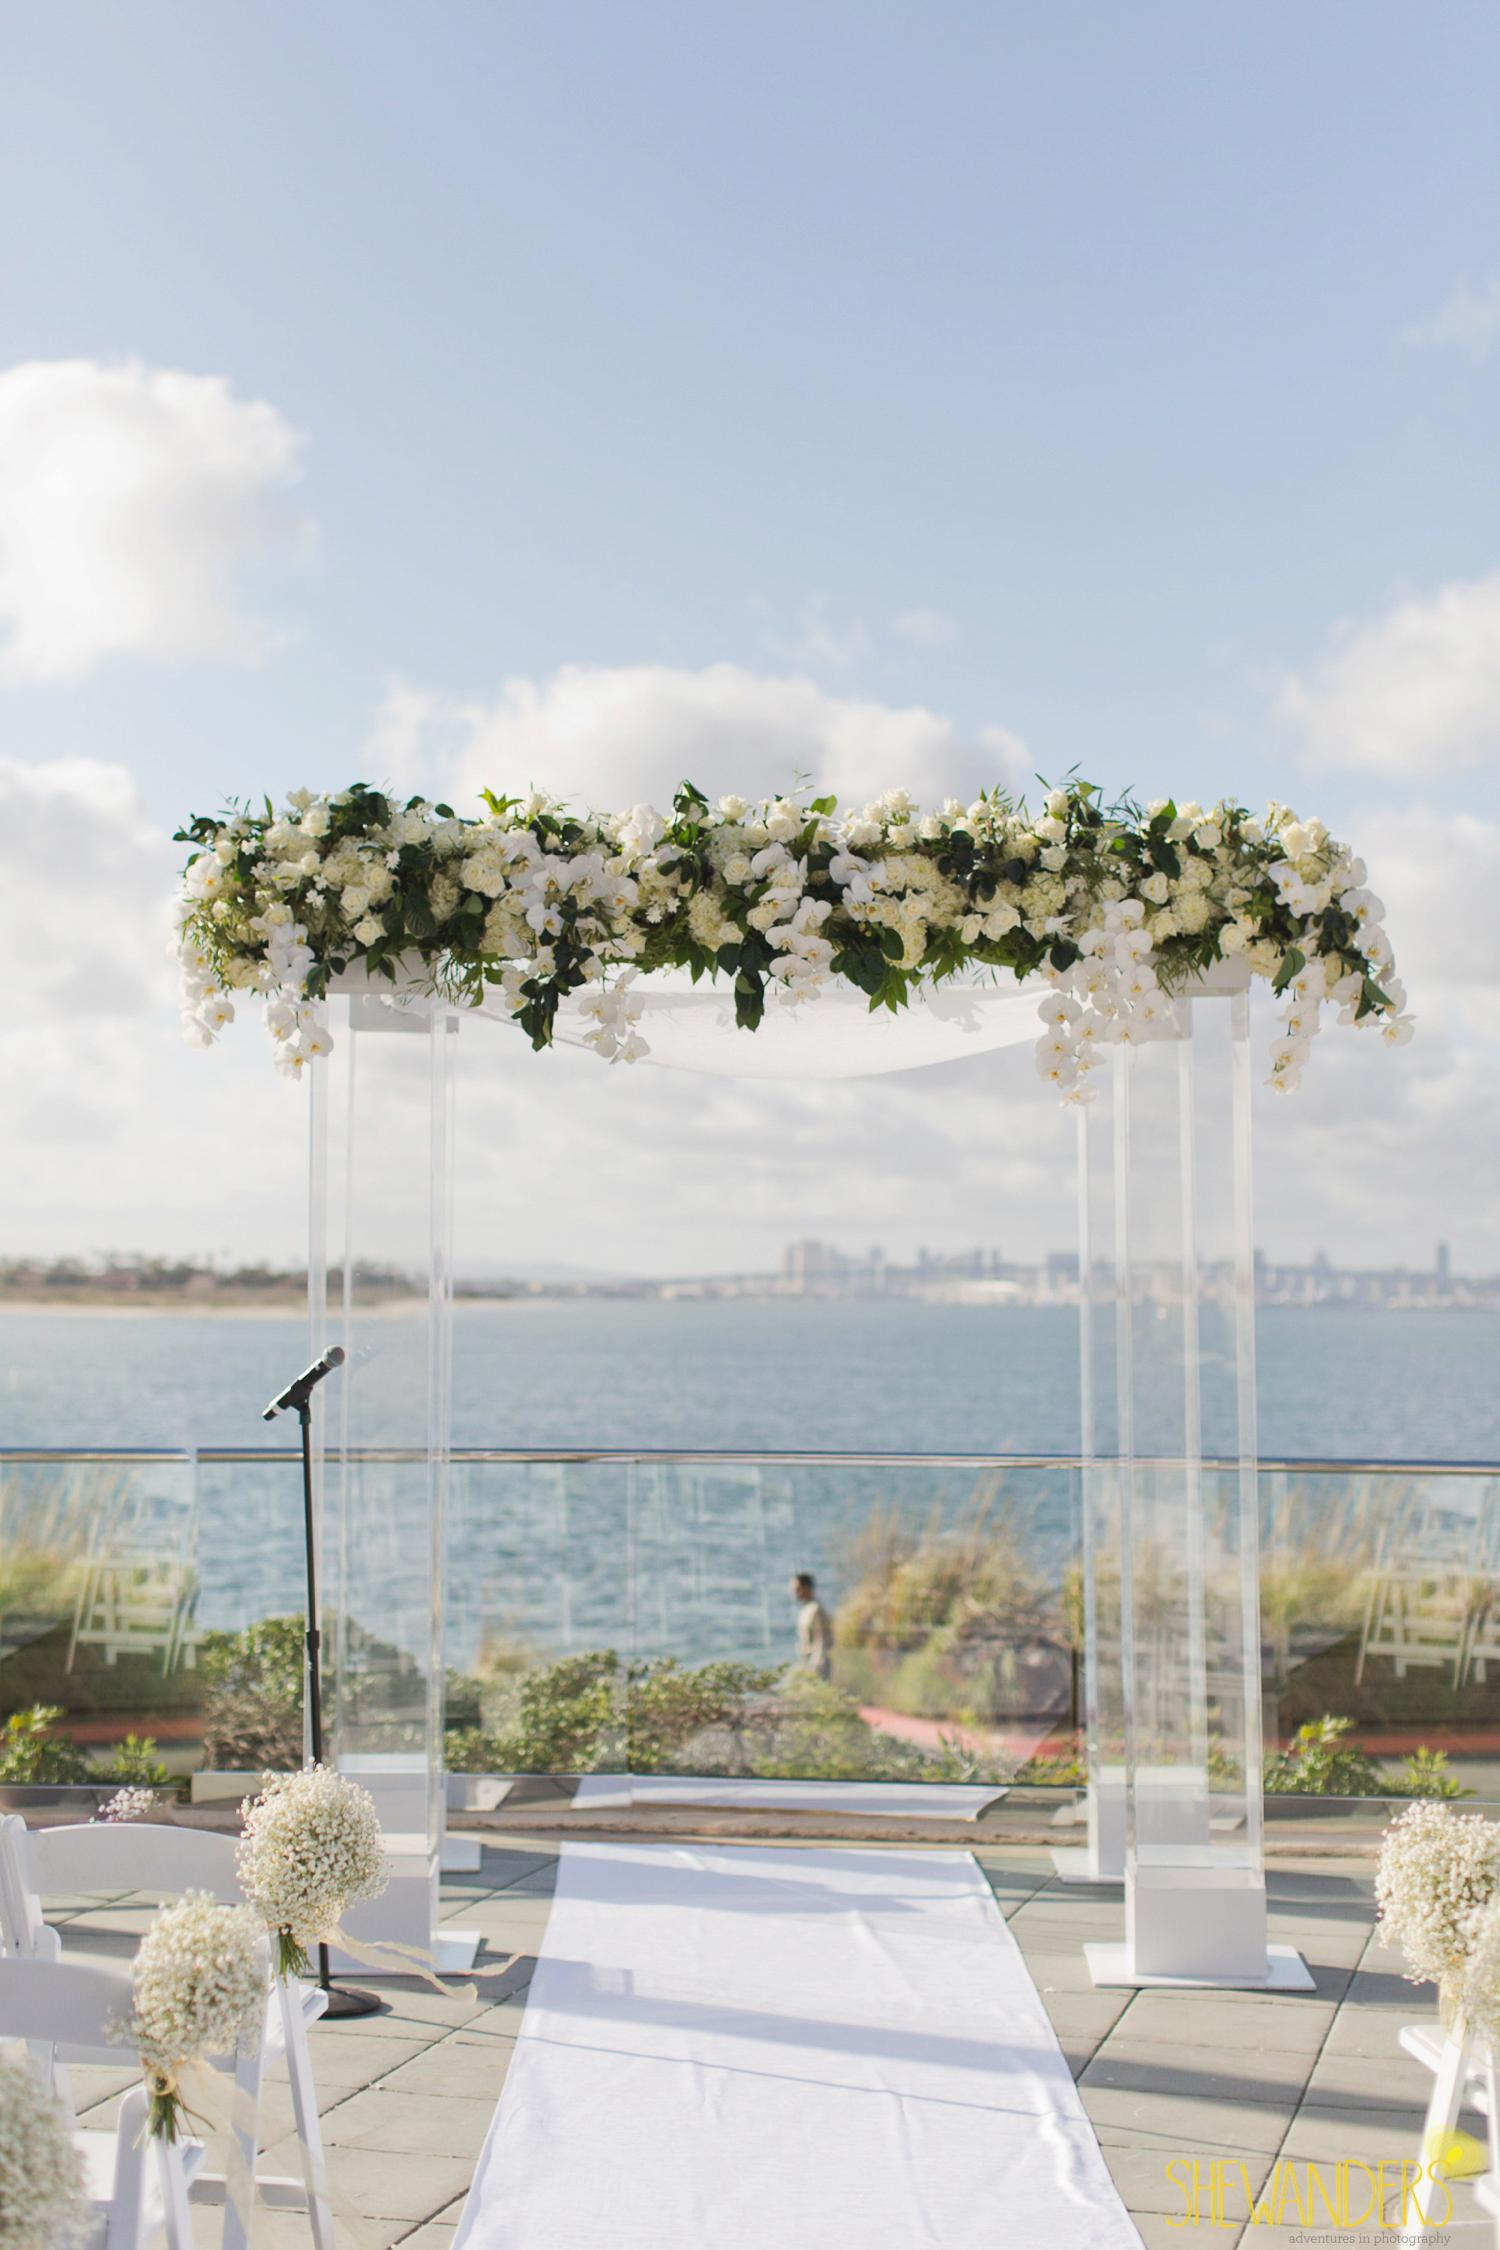 Shewanders.Coronado.Wedding.LaurenJessica-1020.jpg.Wedding.LaurenJessica-1020.jpg